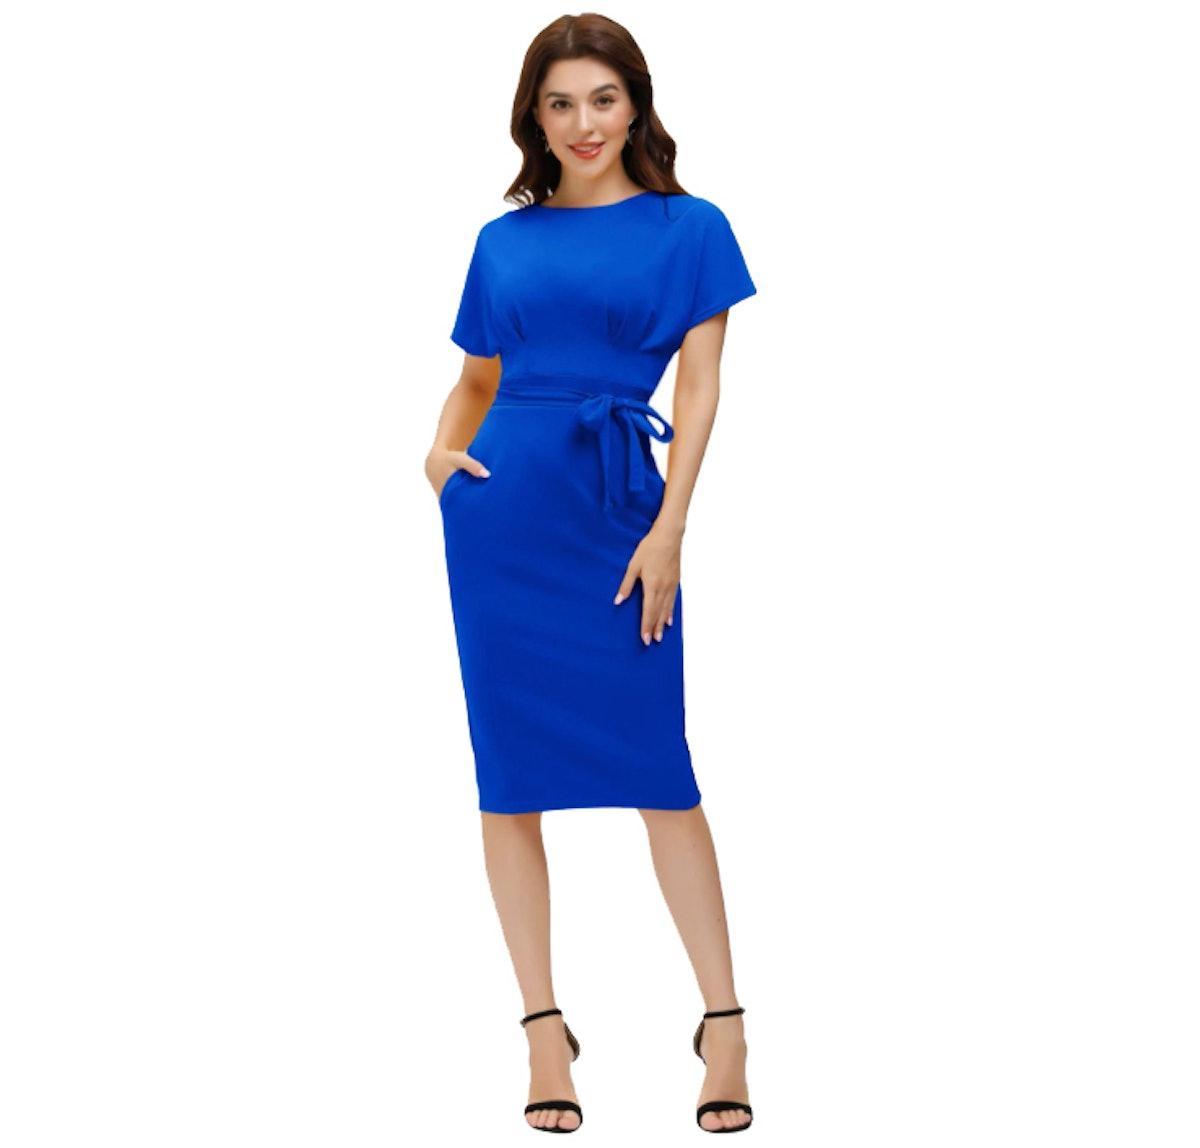 JASAMBAC Women's Bodycon Pencil Dress